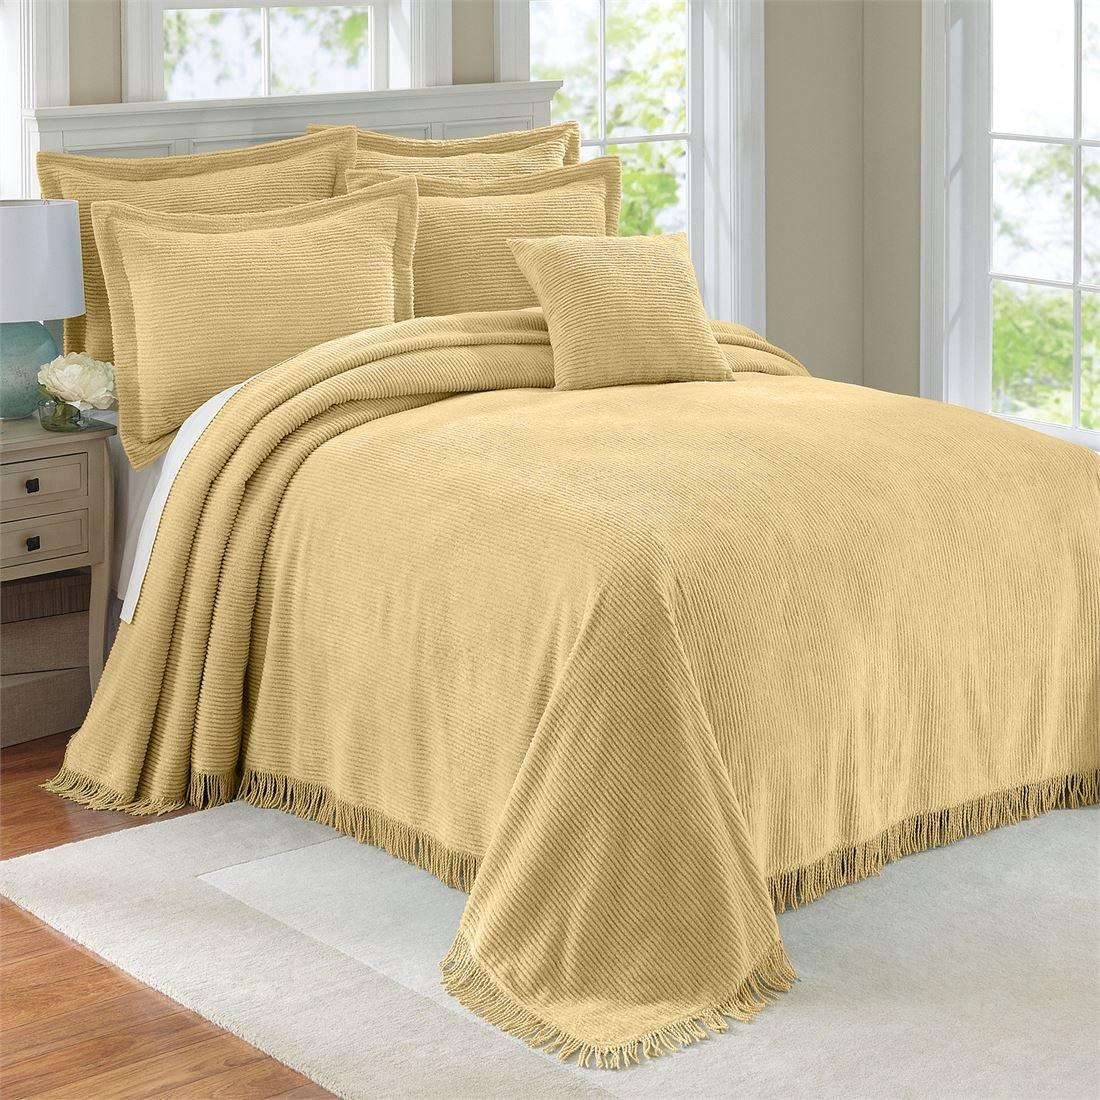 amazoncom brylanehome cotton chenille bedspread buttertwin home u0026 kitchen - Chenille Bedspreads